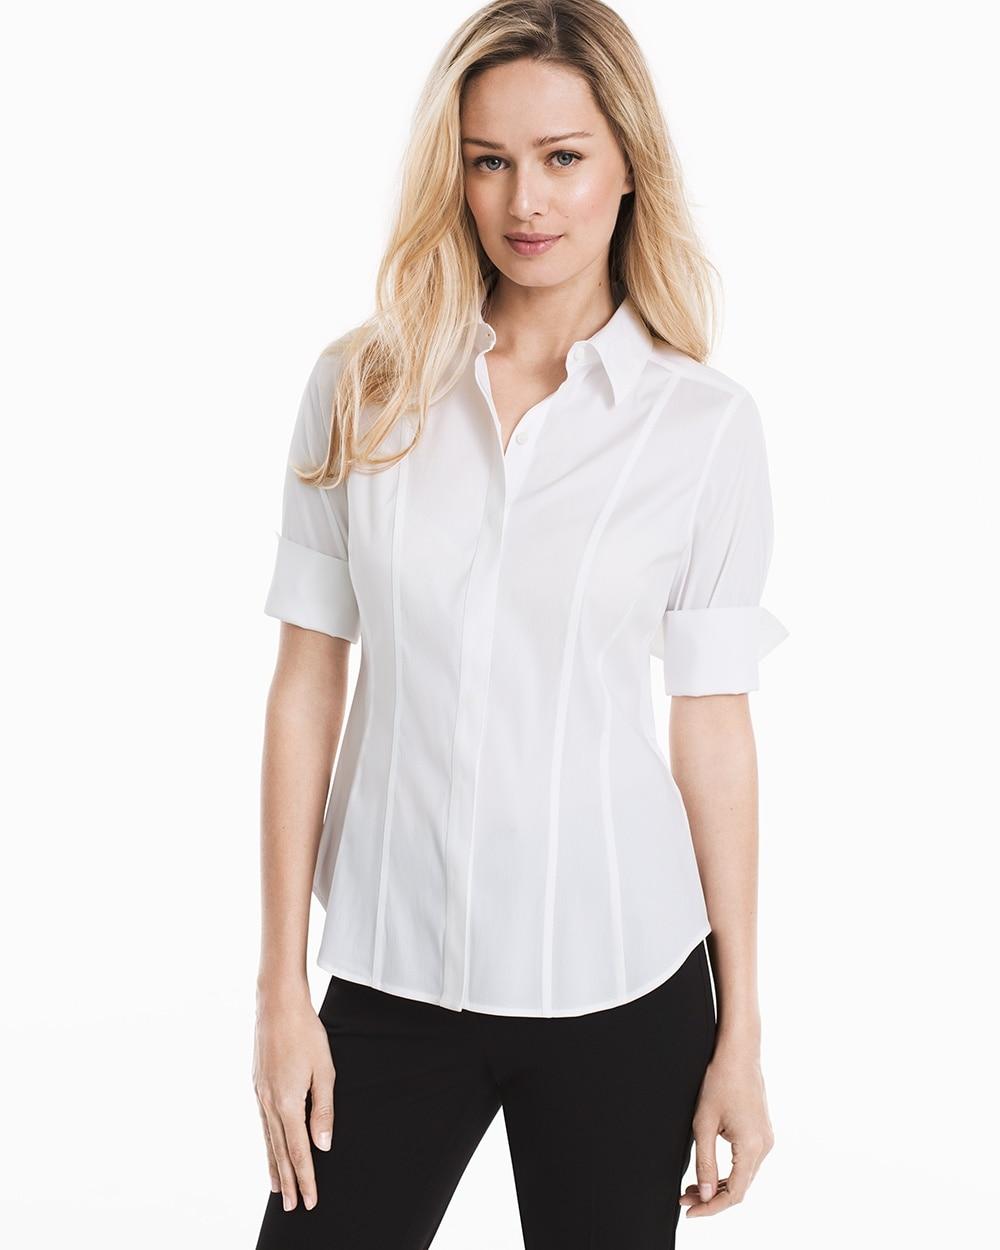 White Wrinkle Free Elbow Sleeve Poplin Shirt Whbm